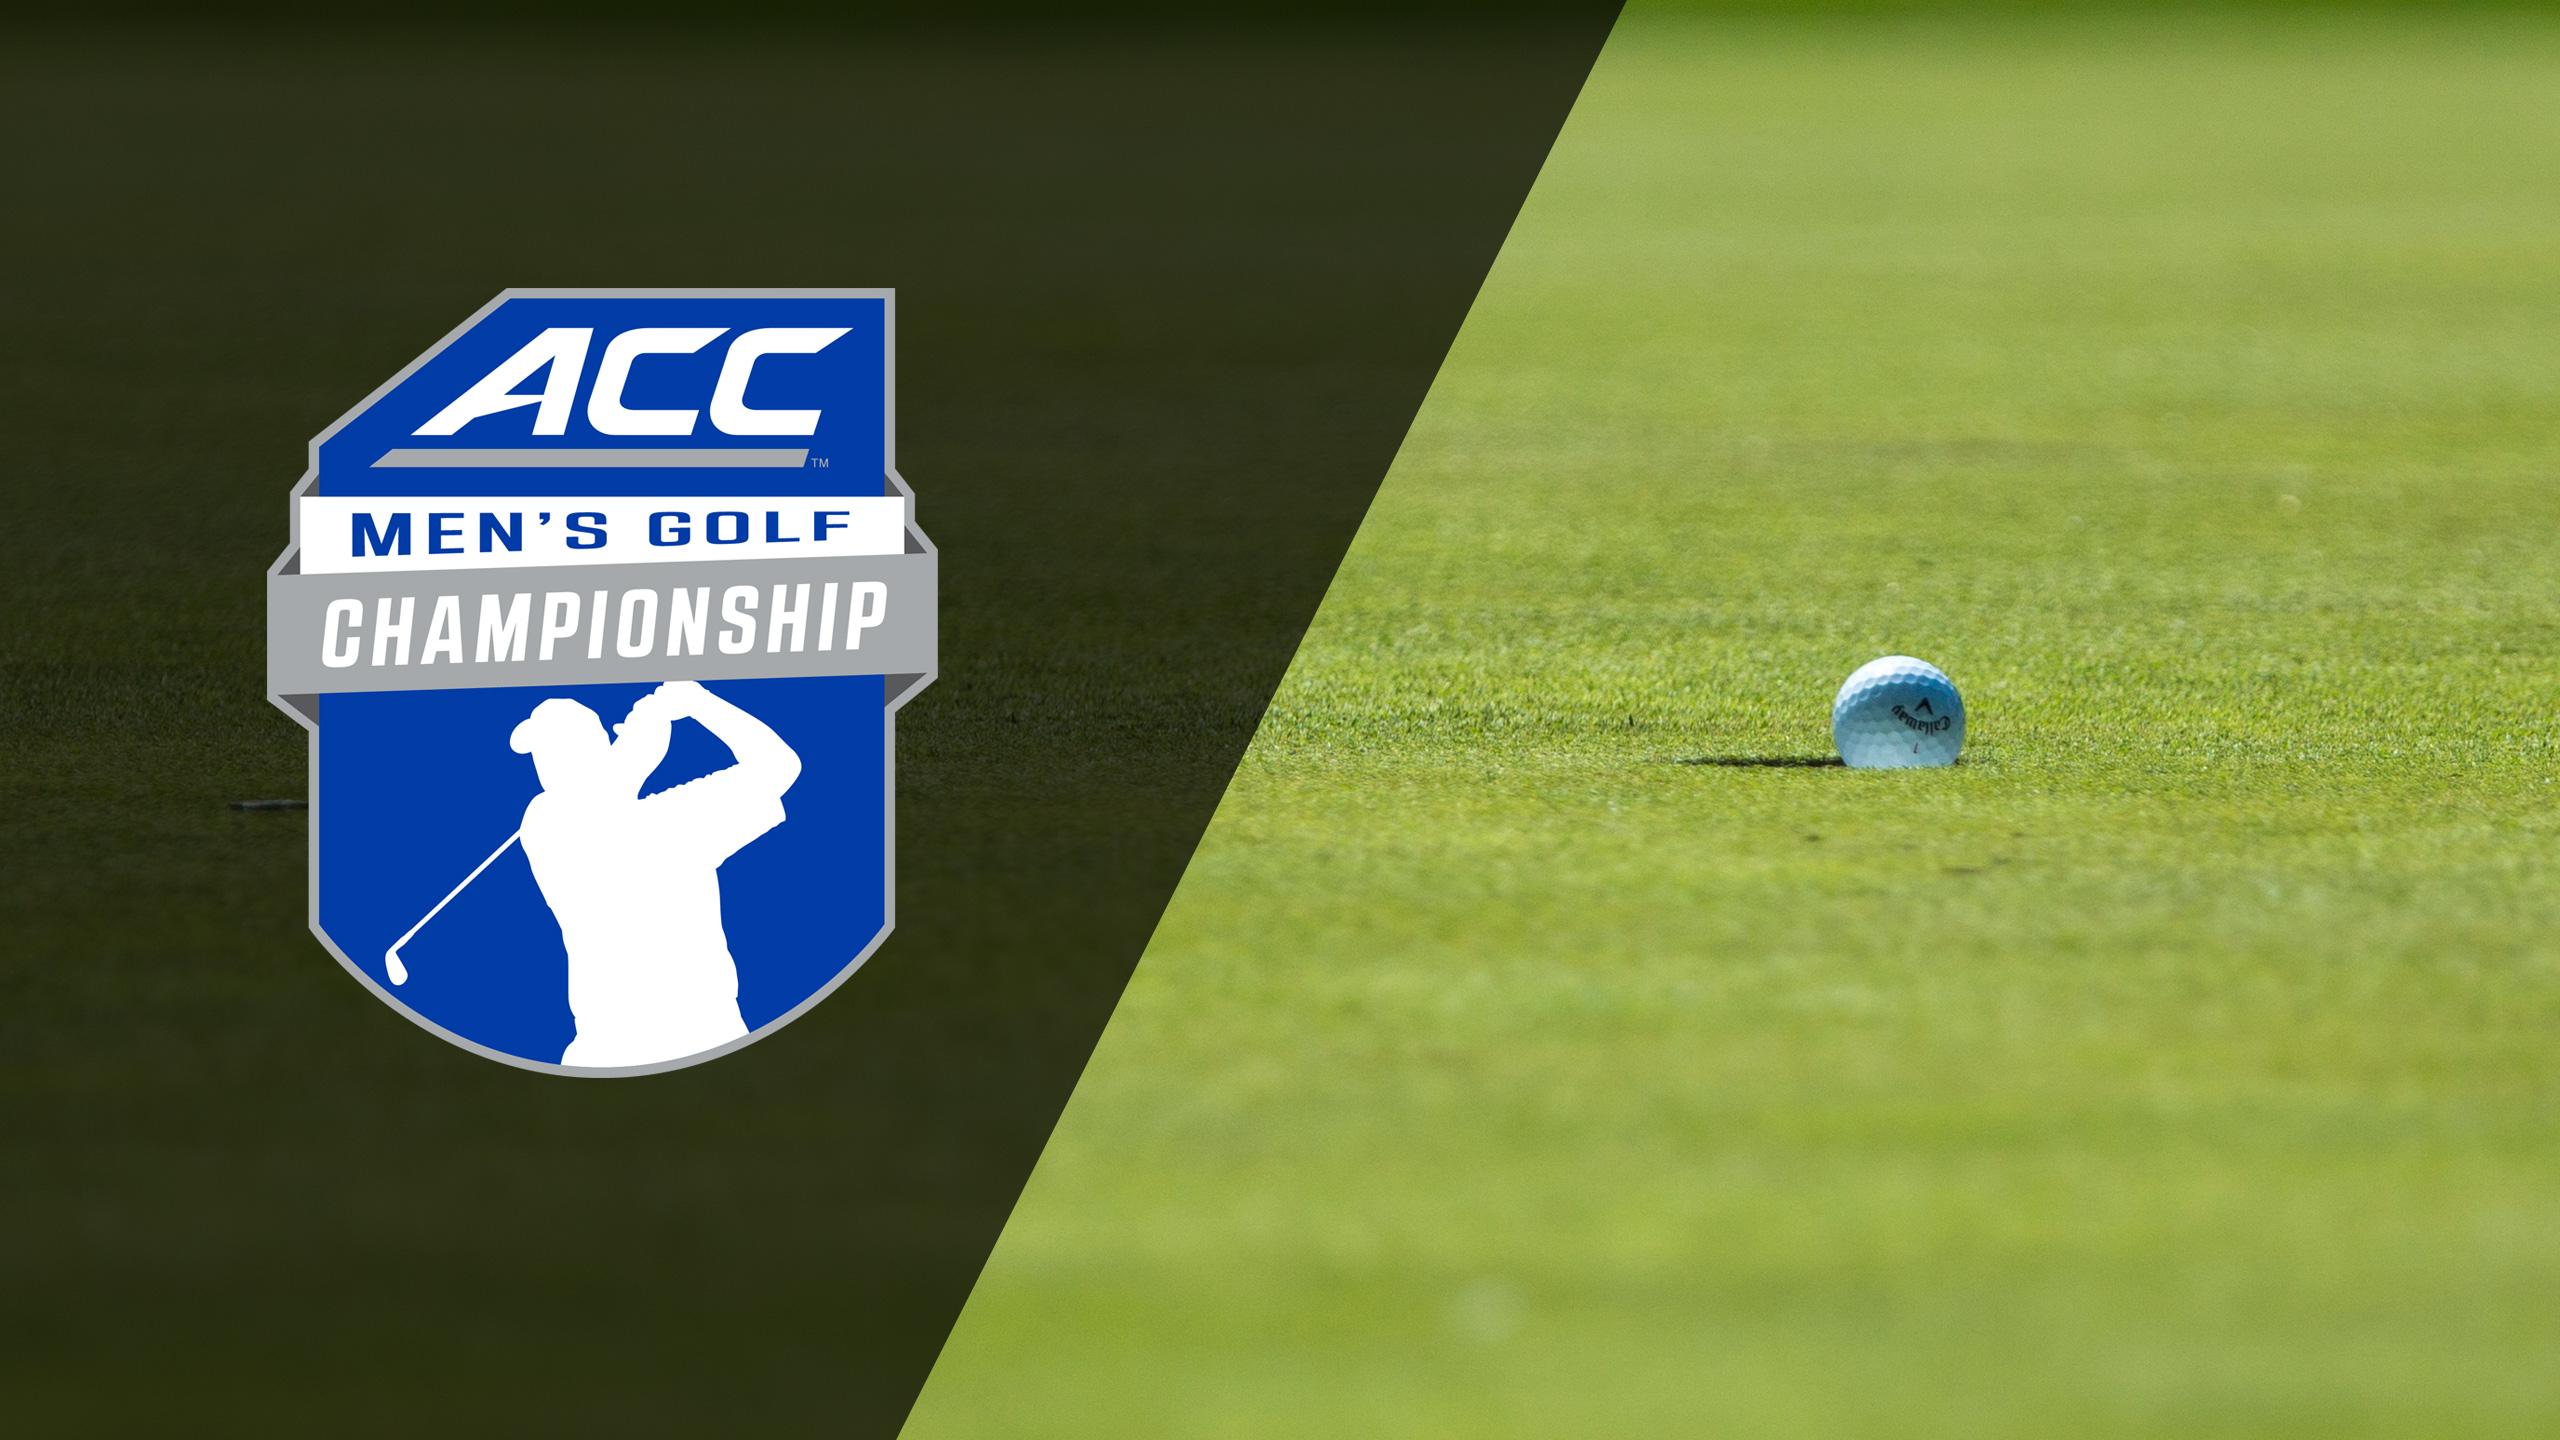 ACC Men's Golf Championship